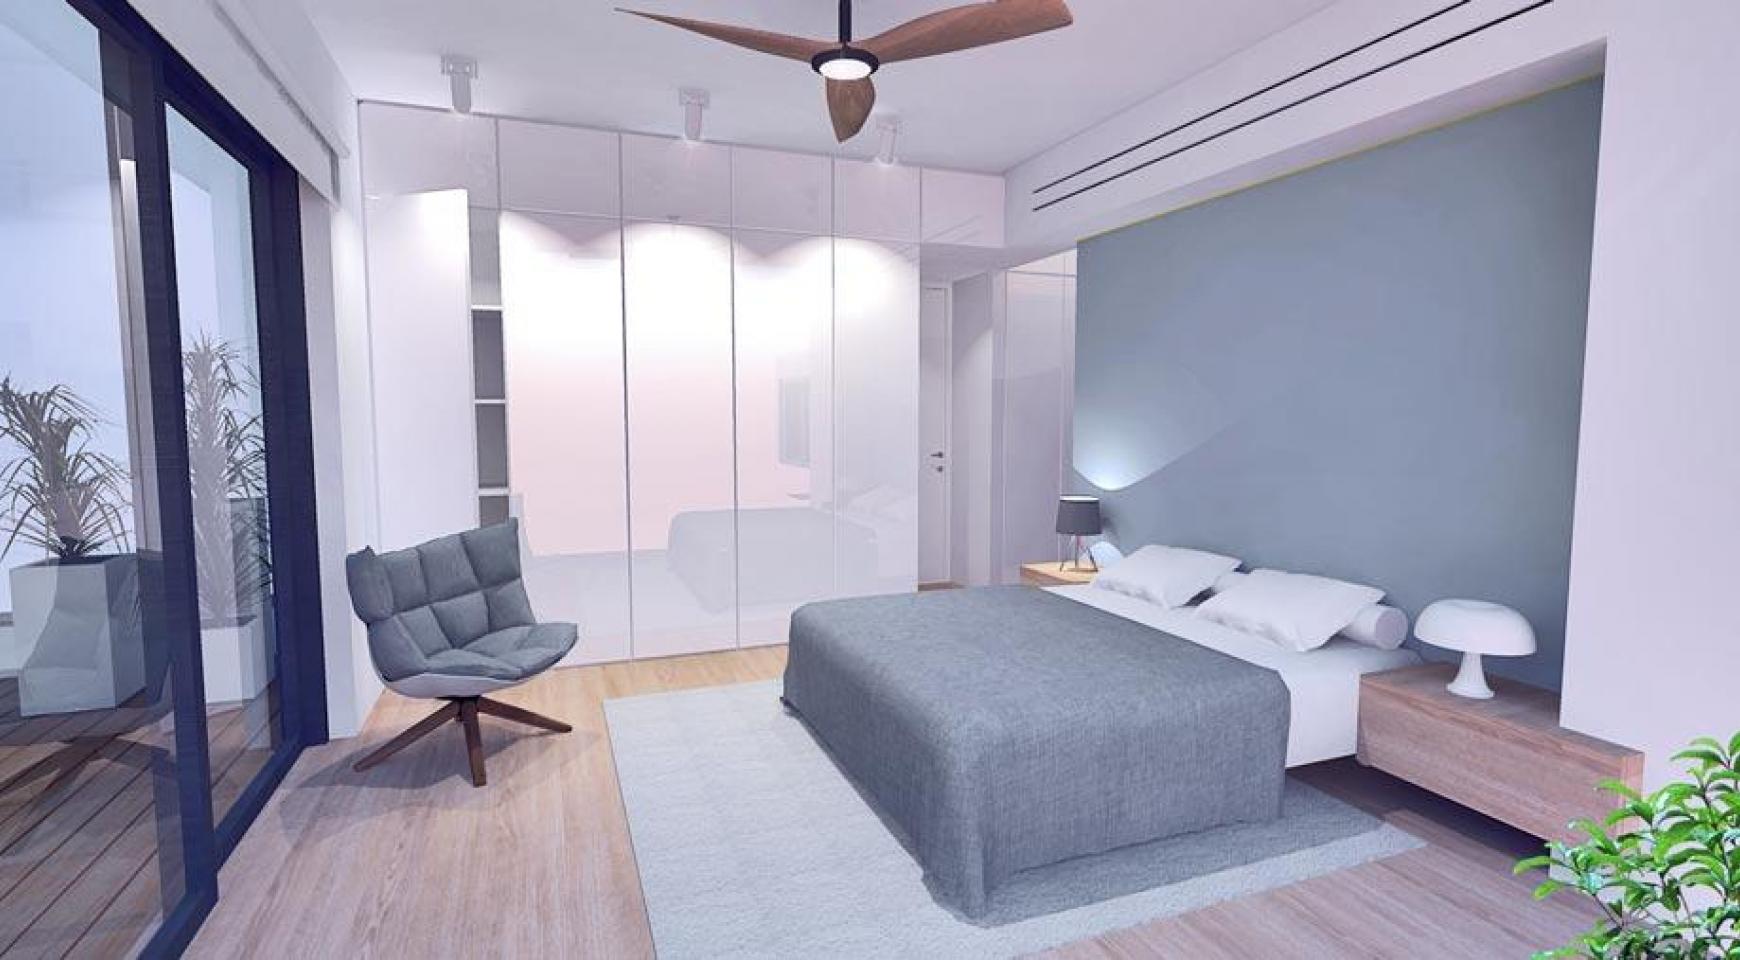 Spacious 4 Bedroom Villa in a New Complex in Agios Athanasios - 9